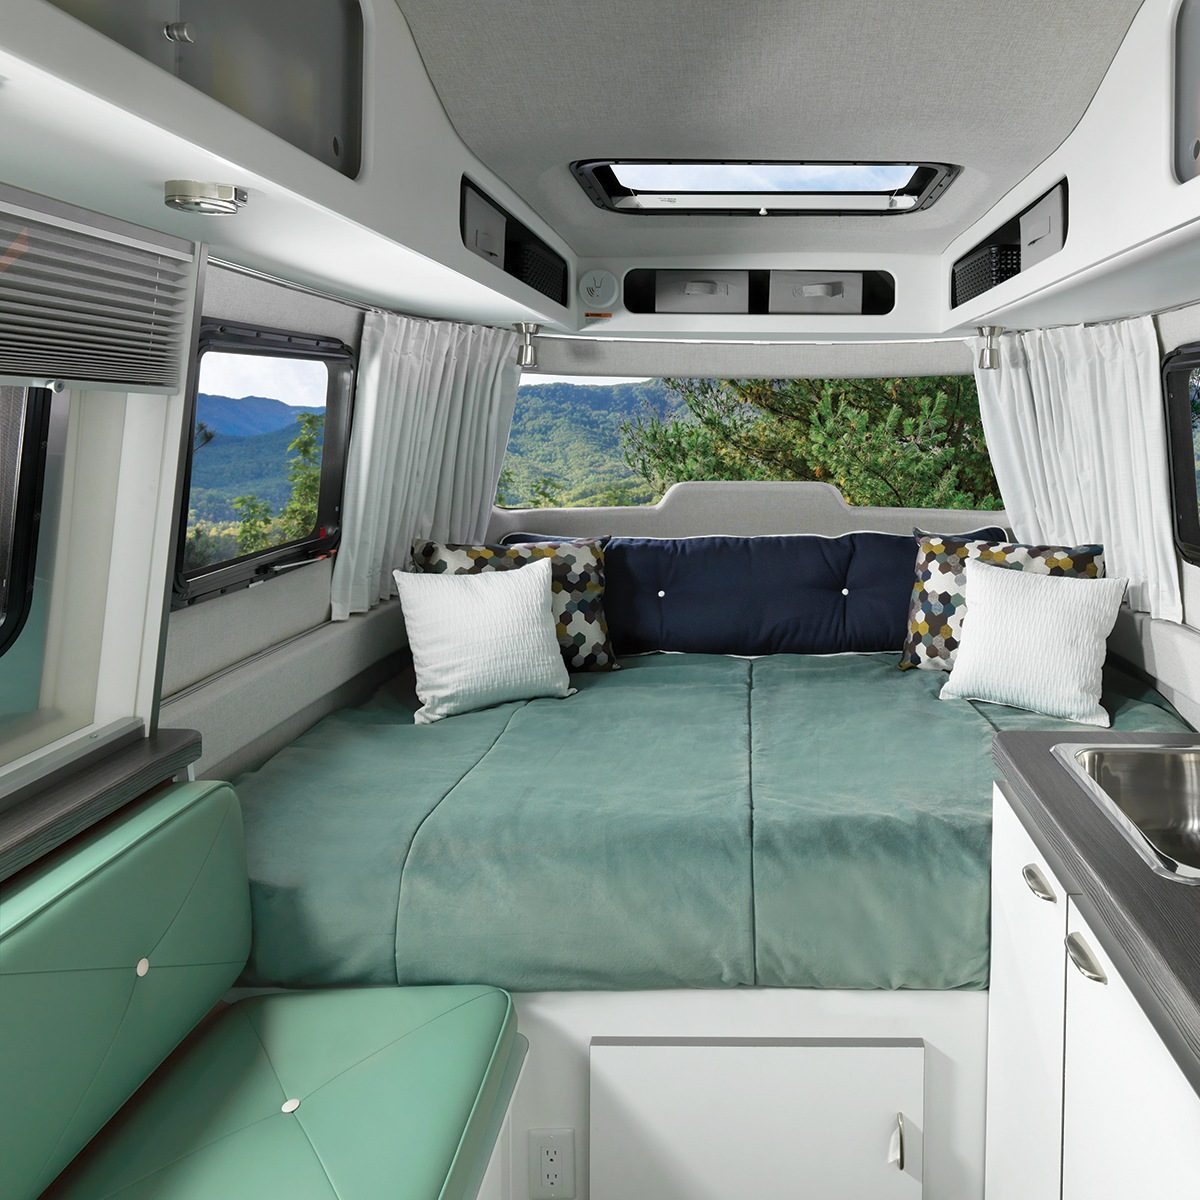 Nest by Airstream interior decor blue